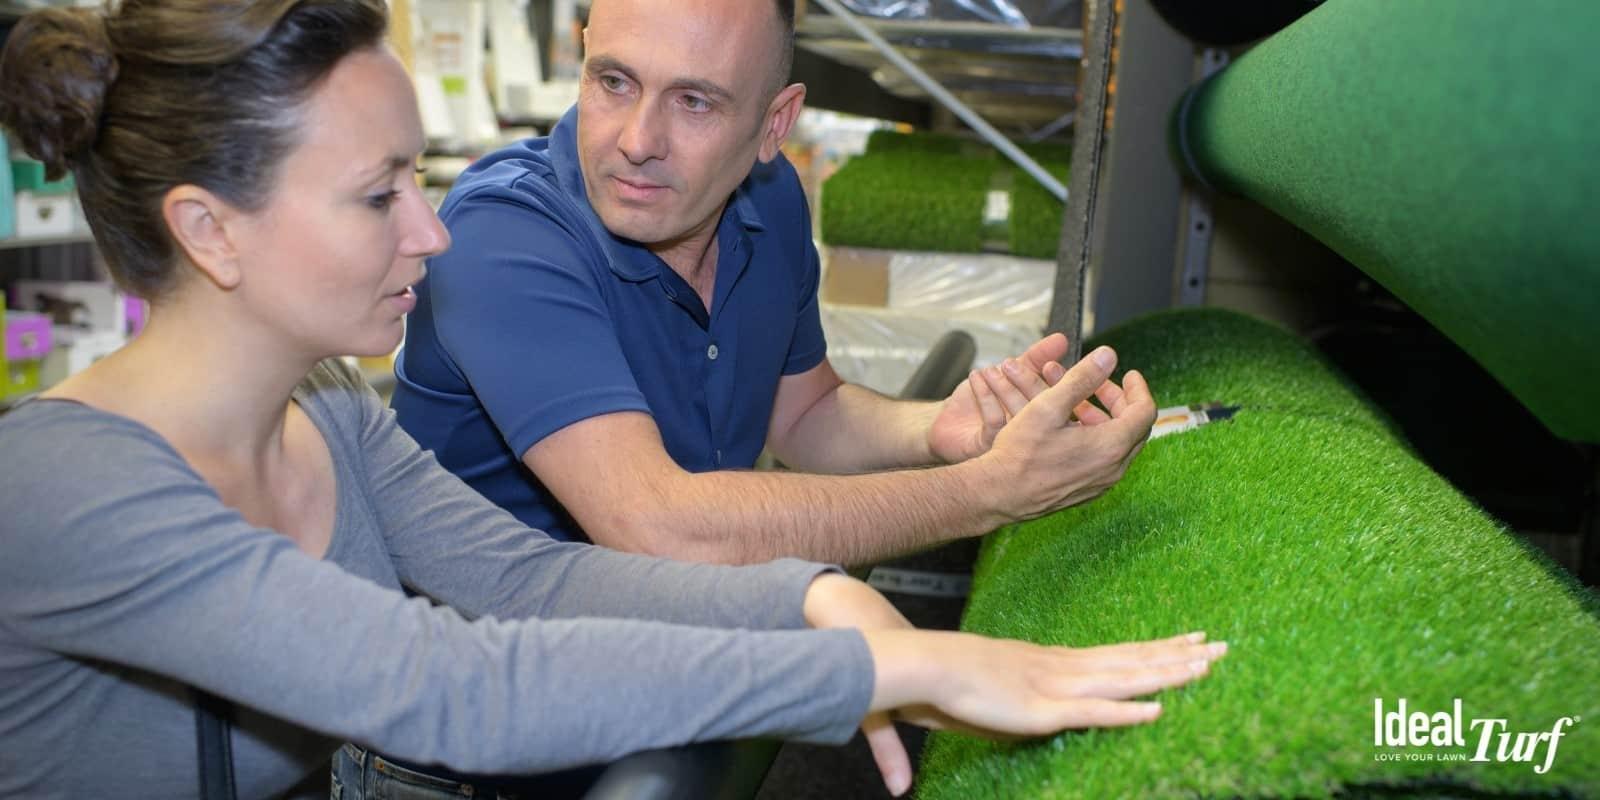 Woman touching roll of artificial grass